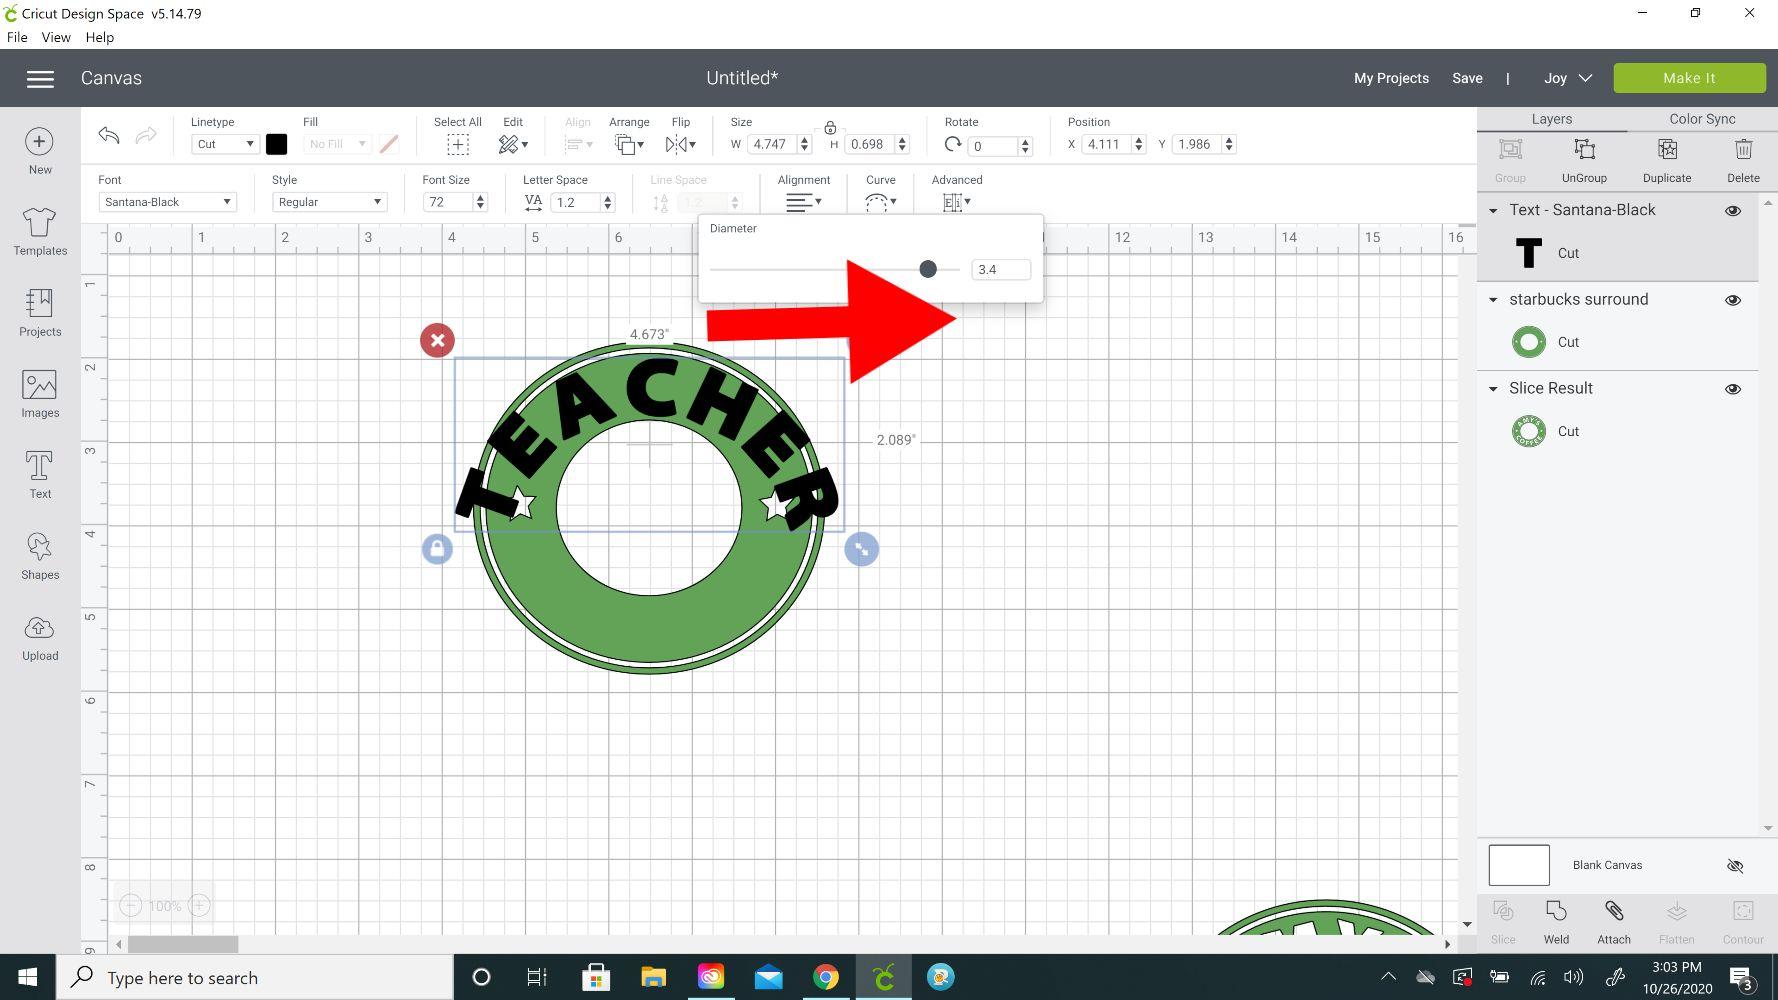 curving starbucks editable template